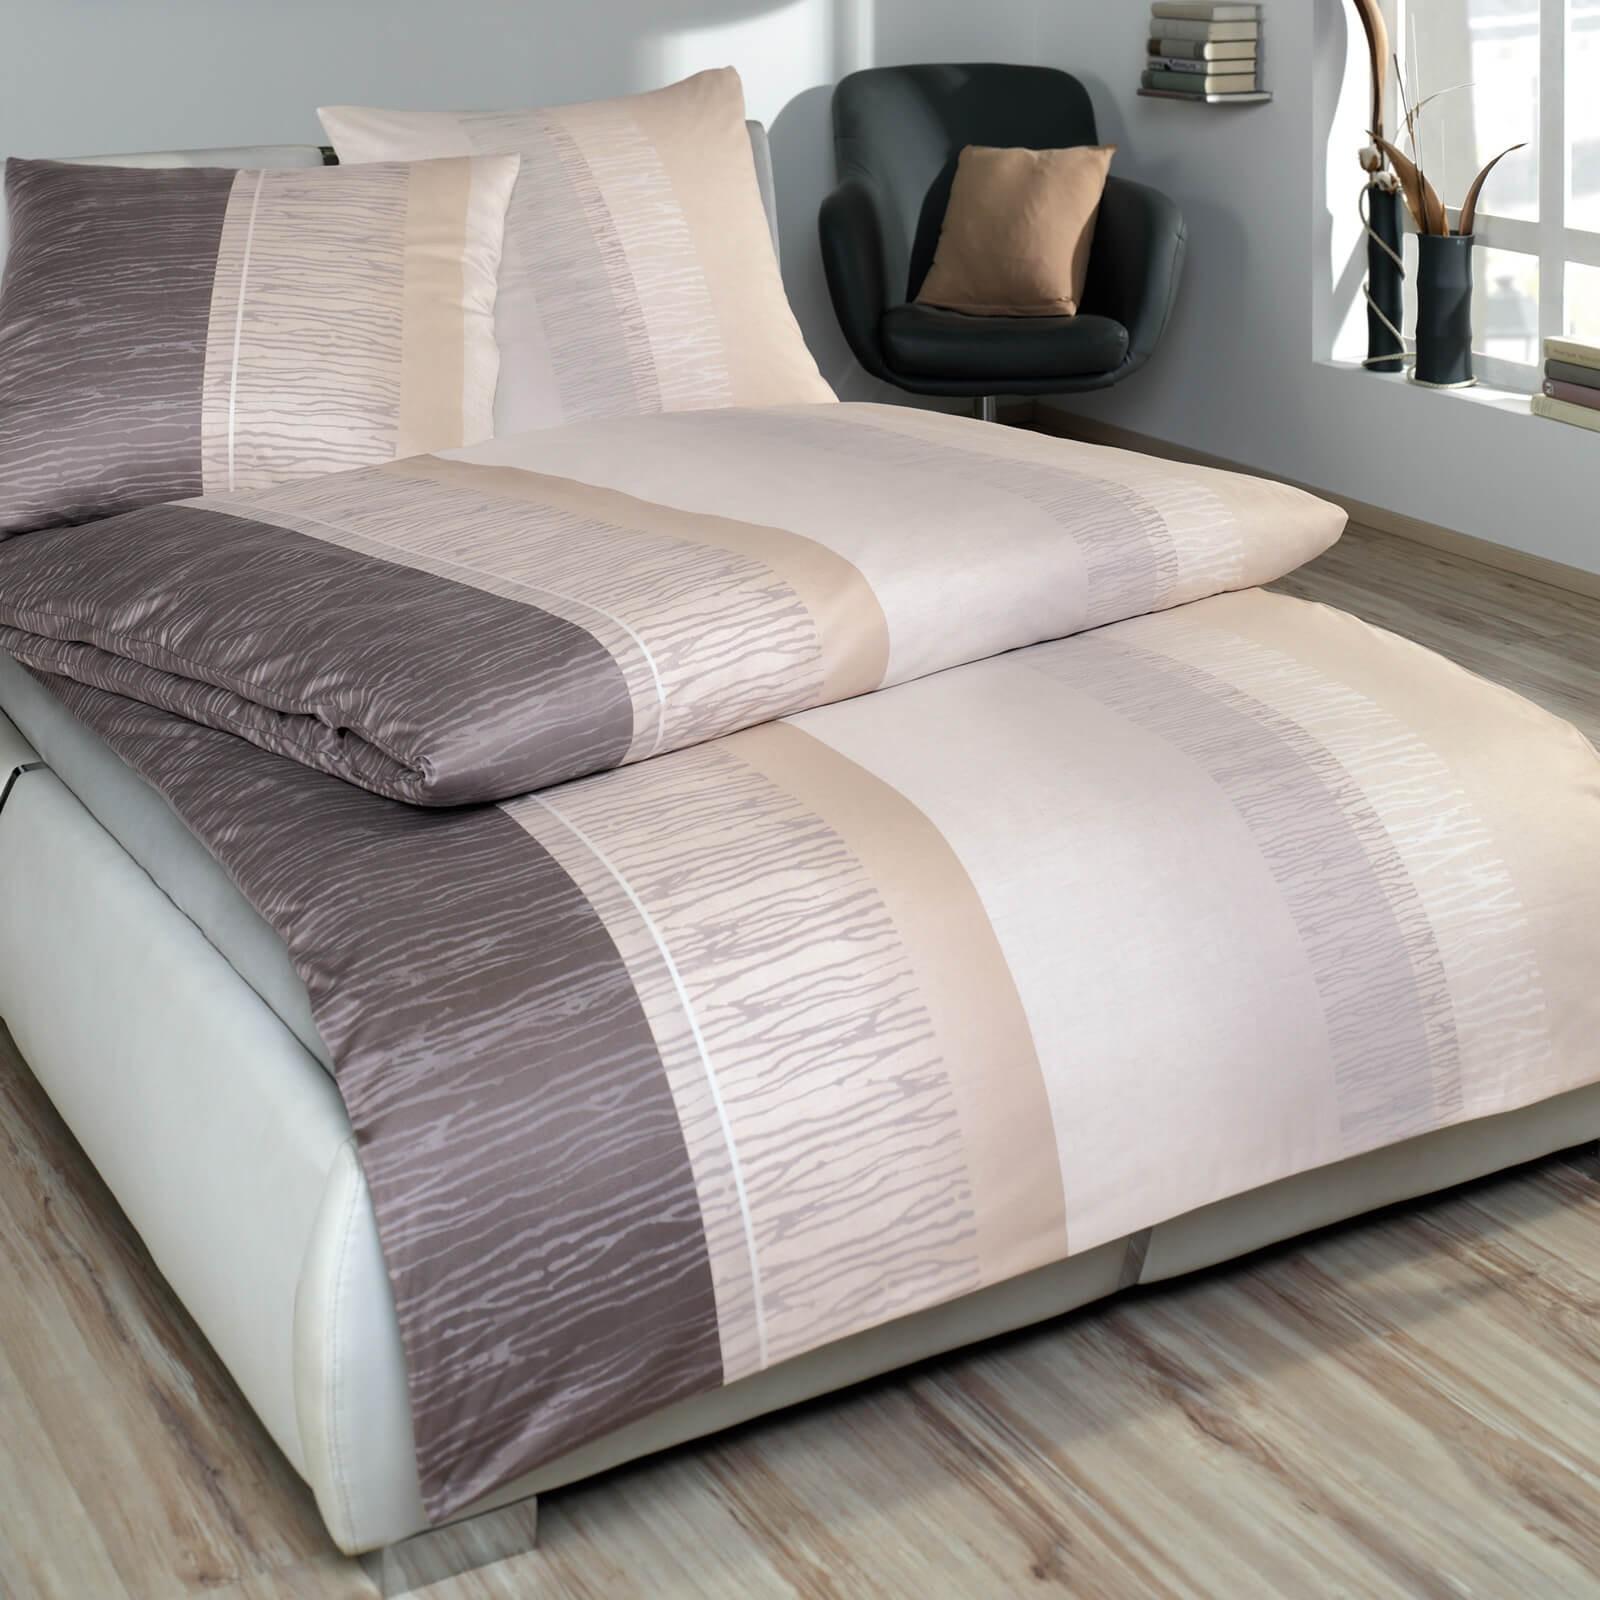 bettw sche estella eimo 6440 kiesel. Black Bedroom Furniture Sets. Home Design Ideas